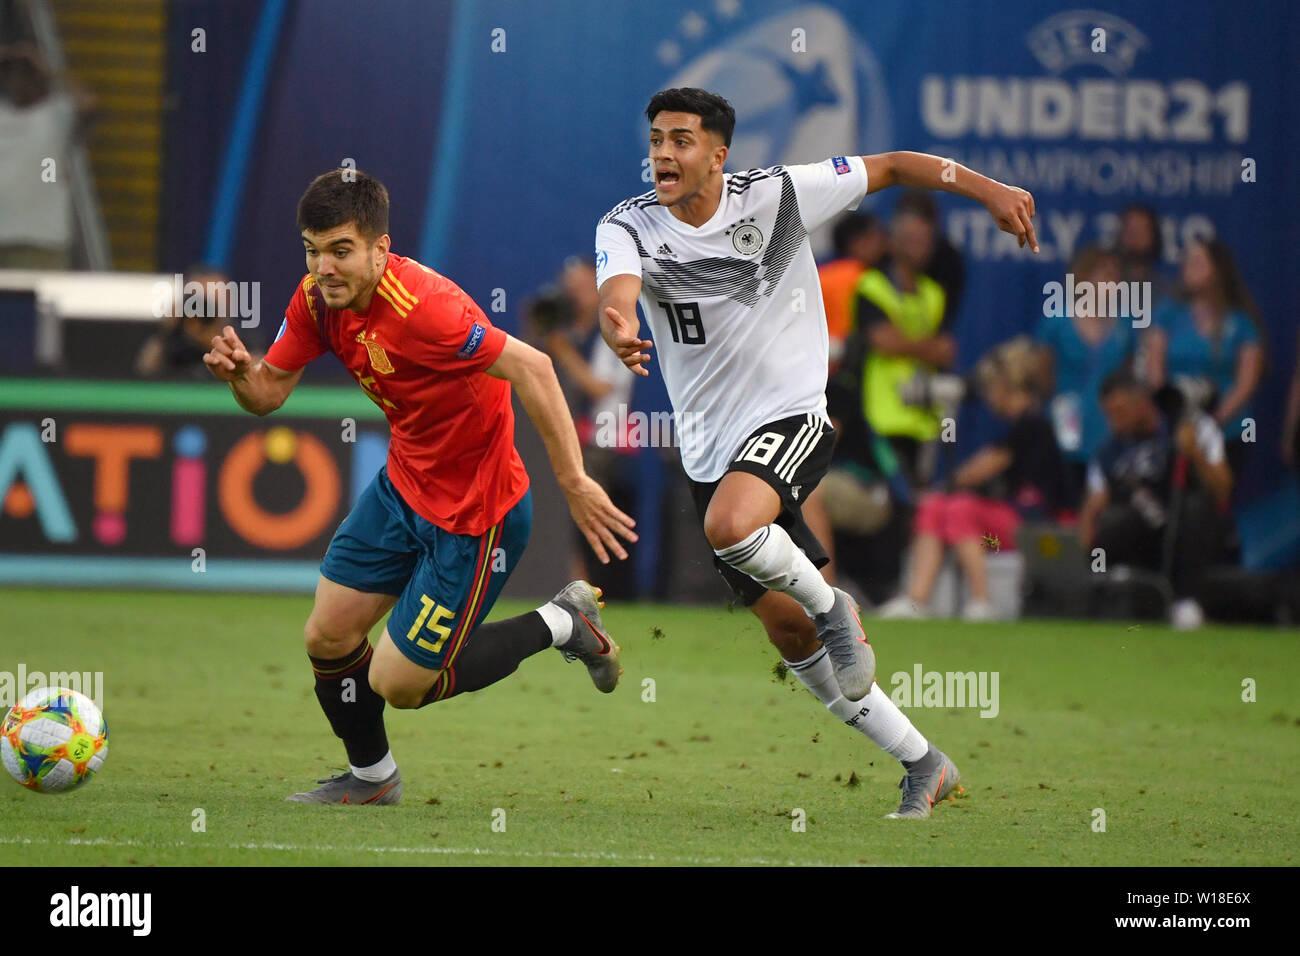 Nadiem AMIRI (GER), Action, duels versus Martin AGUIRREGABIRIA (ESP). Spain (ESP) - Germany (GER) 2-1, at 30.06.2019 Stadio Friuli Udine. Football U-21, FINALE UEFA Under21 European Championship in Italy/SanMarino from 16.-30.06.2019. | Usage worldwide - Stock Image